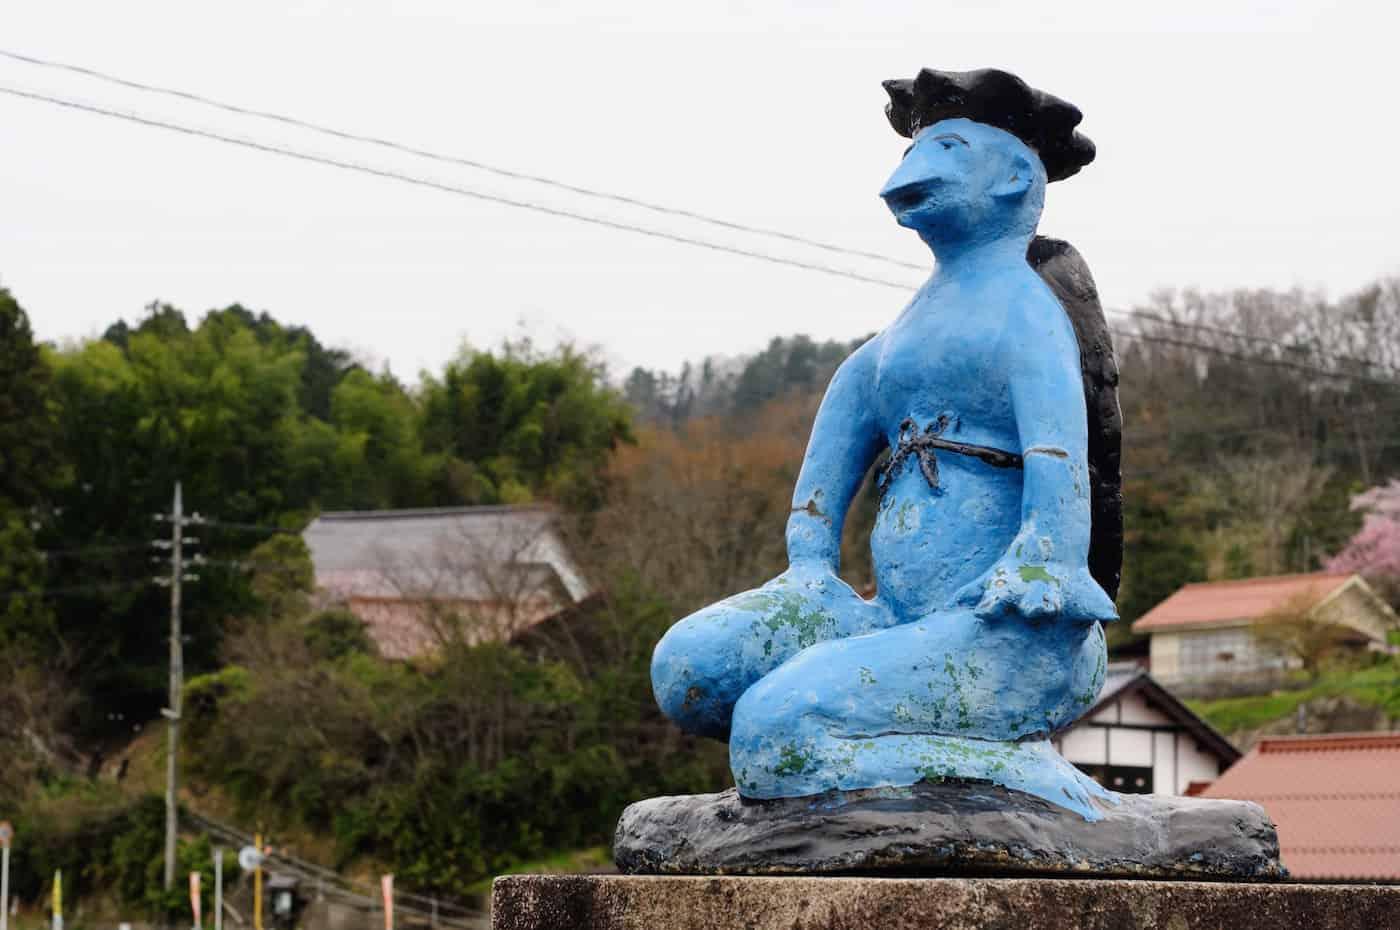 kapp on the bridge in Izuwa, Ohnan, Shimane Prefecture in Japan